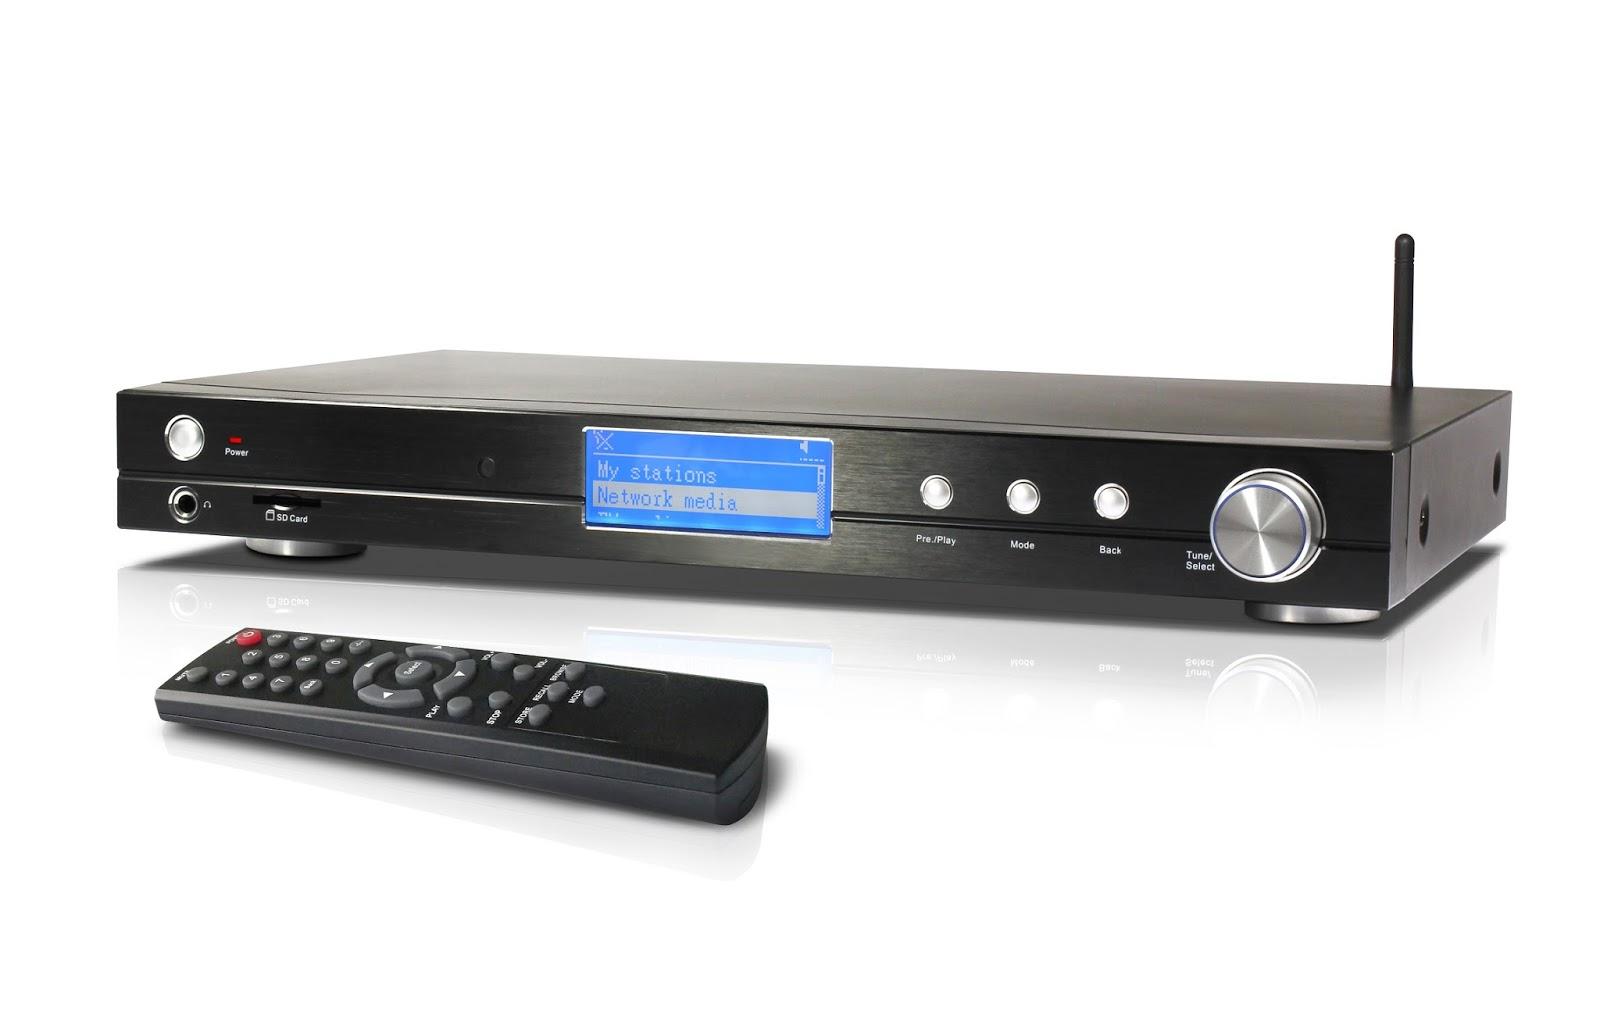 digital home audio music media player wireless network internet radio receiver hi fi dab fm. Black Bedroom Furniture Sets. Home Design Ideas